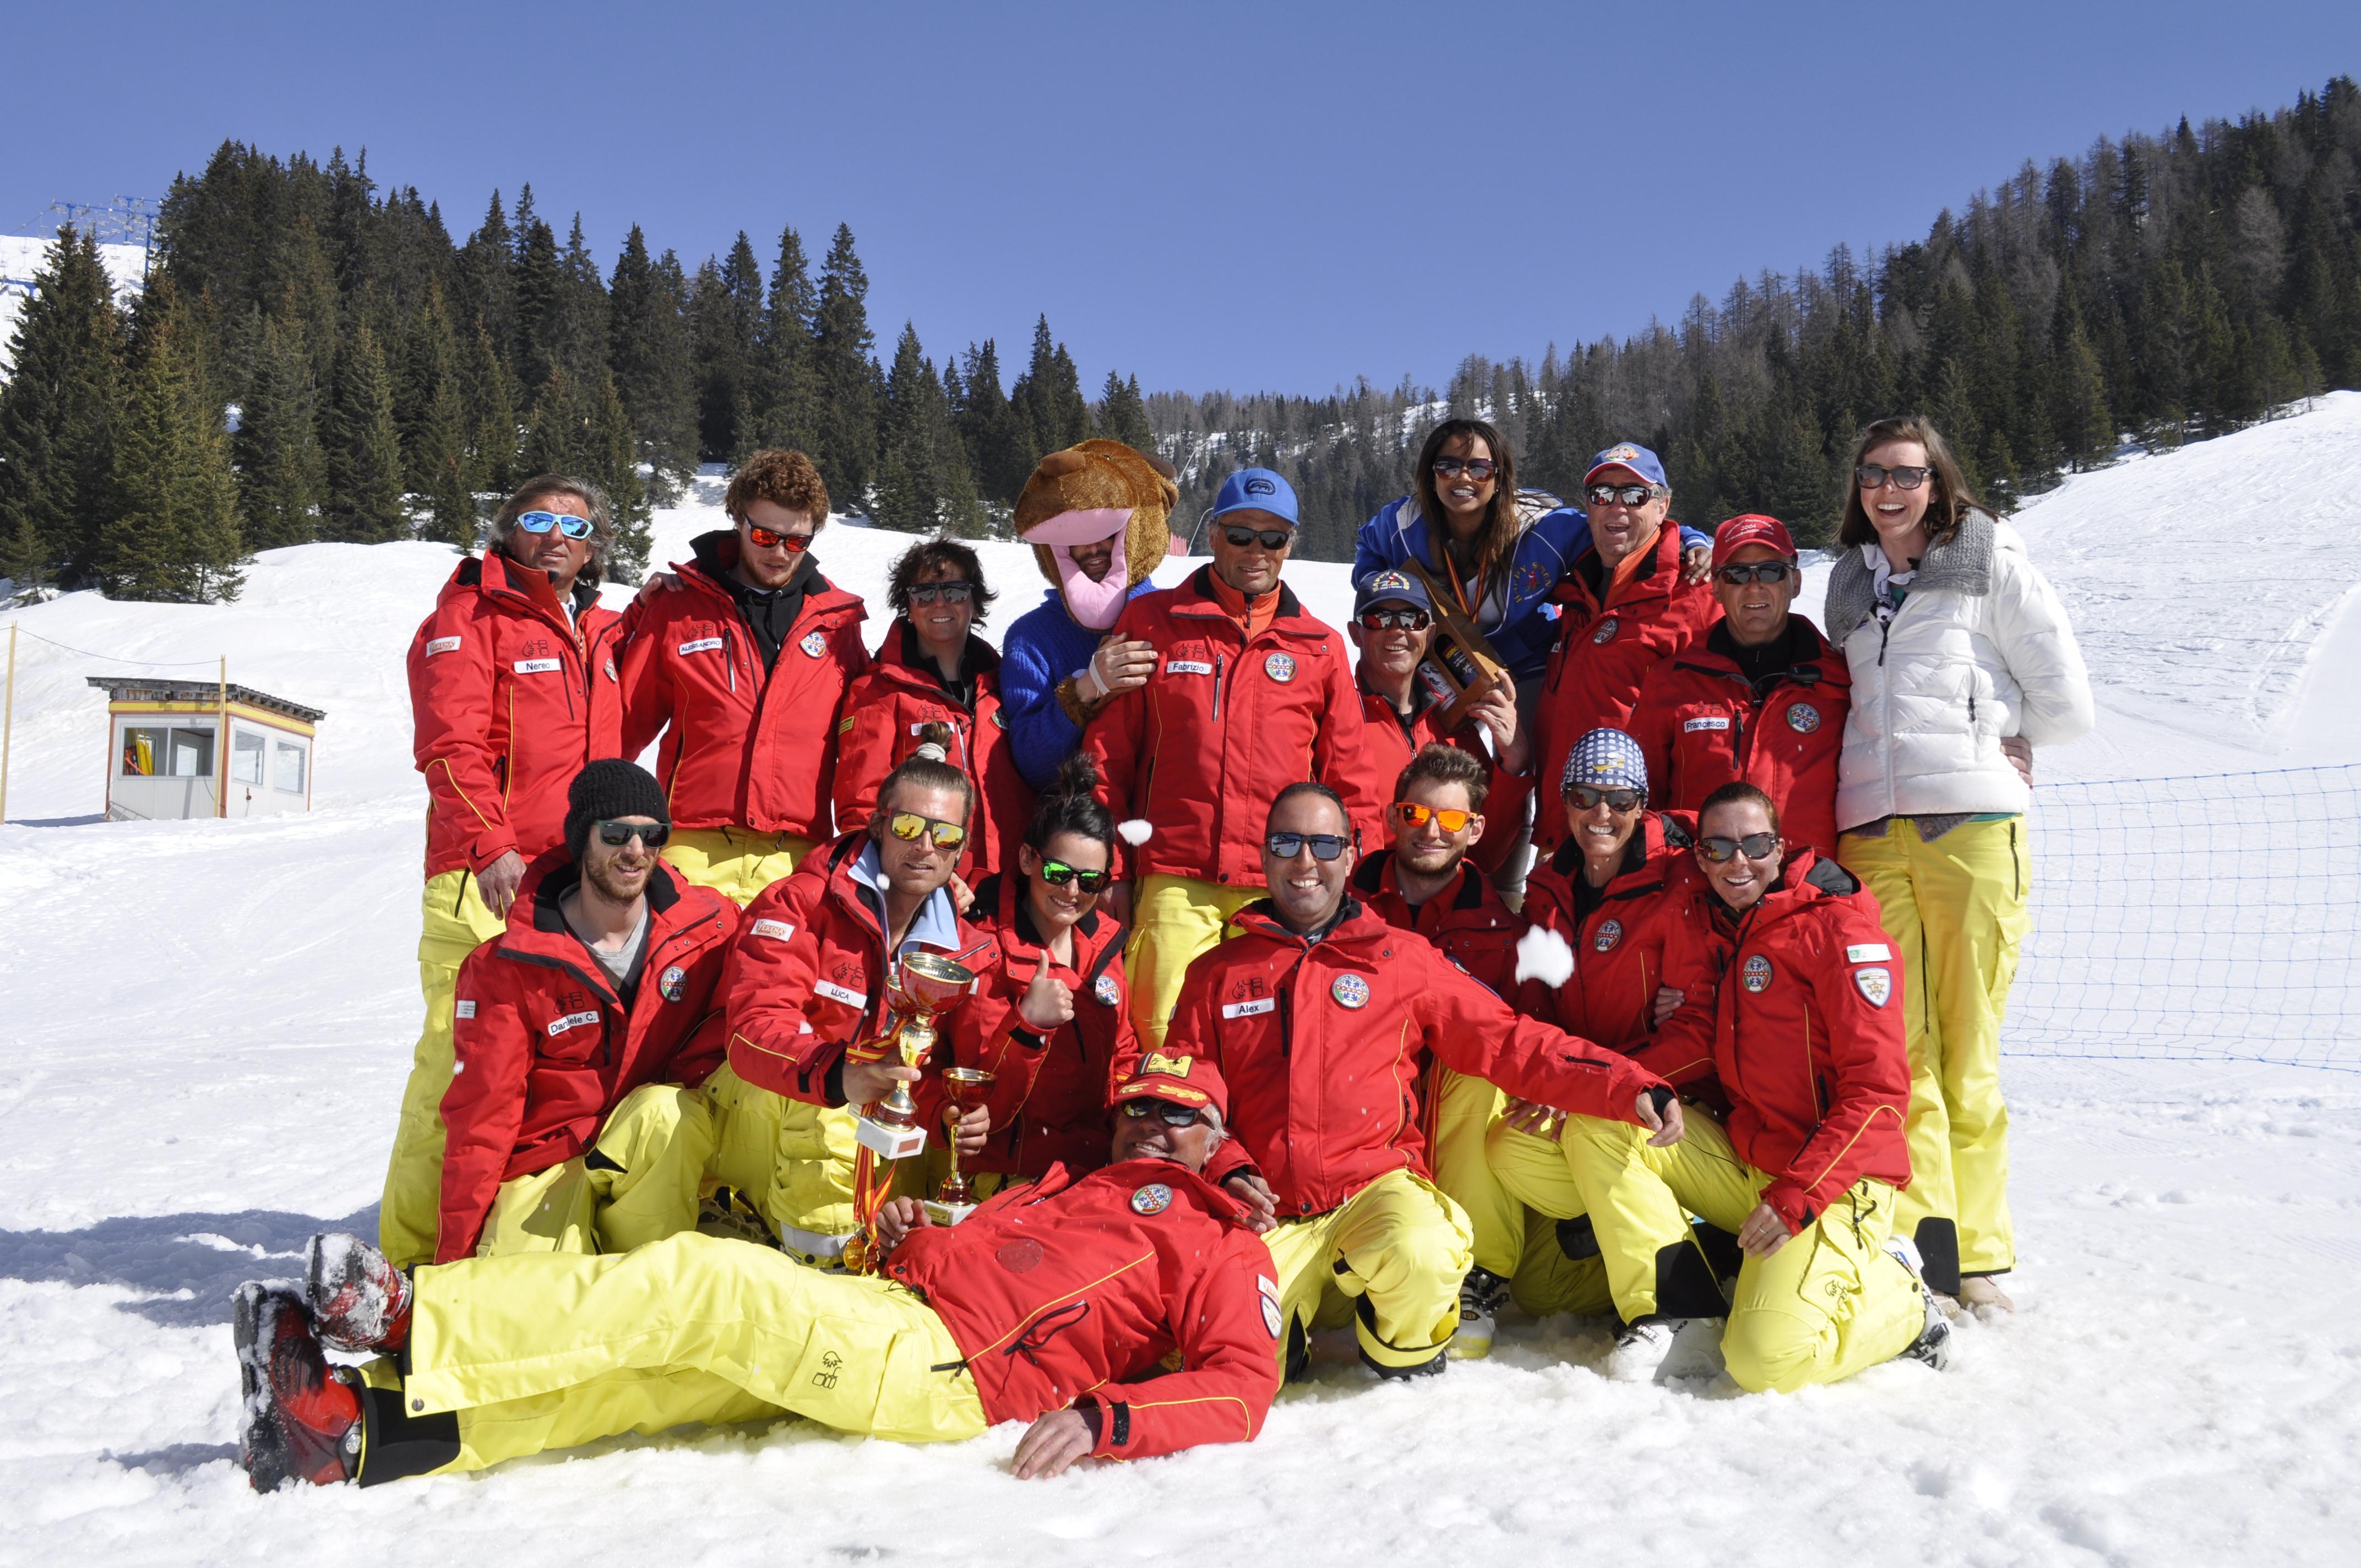 Offerte sciare settimana bianca neve 2016 bambini gratis for Asiago offerte